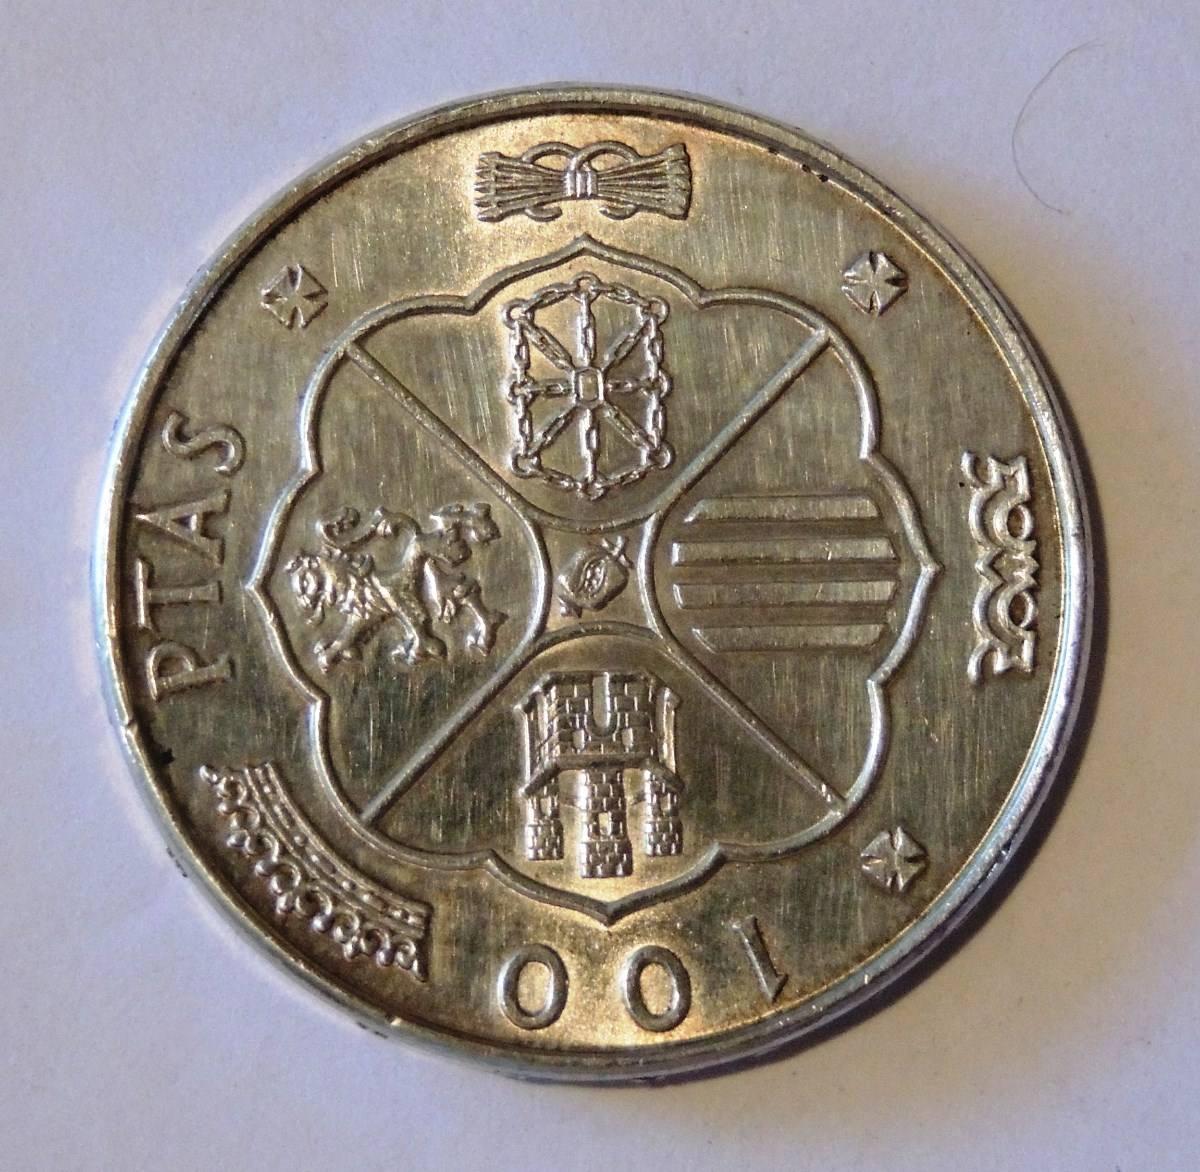 100 pesetas: